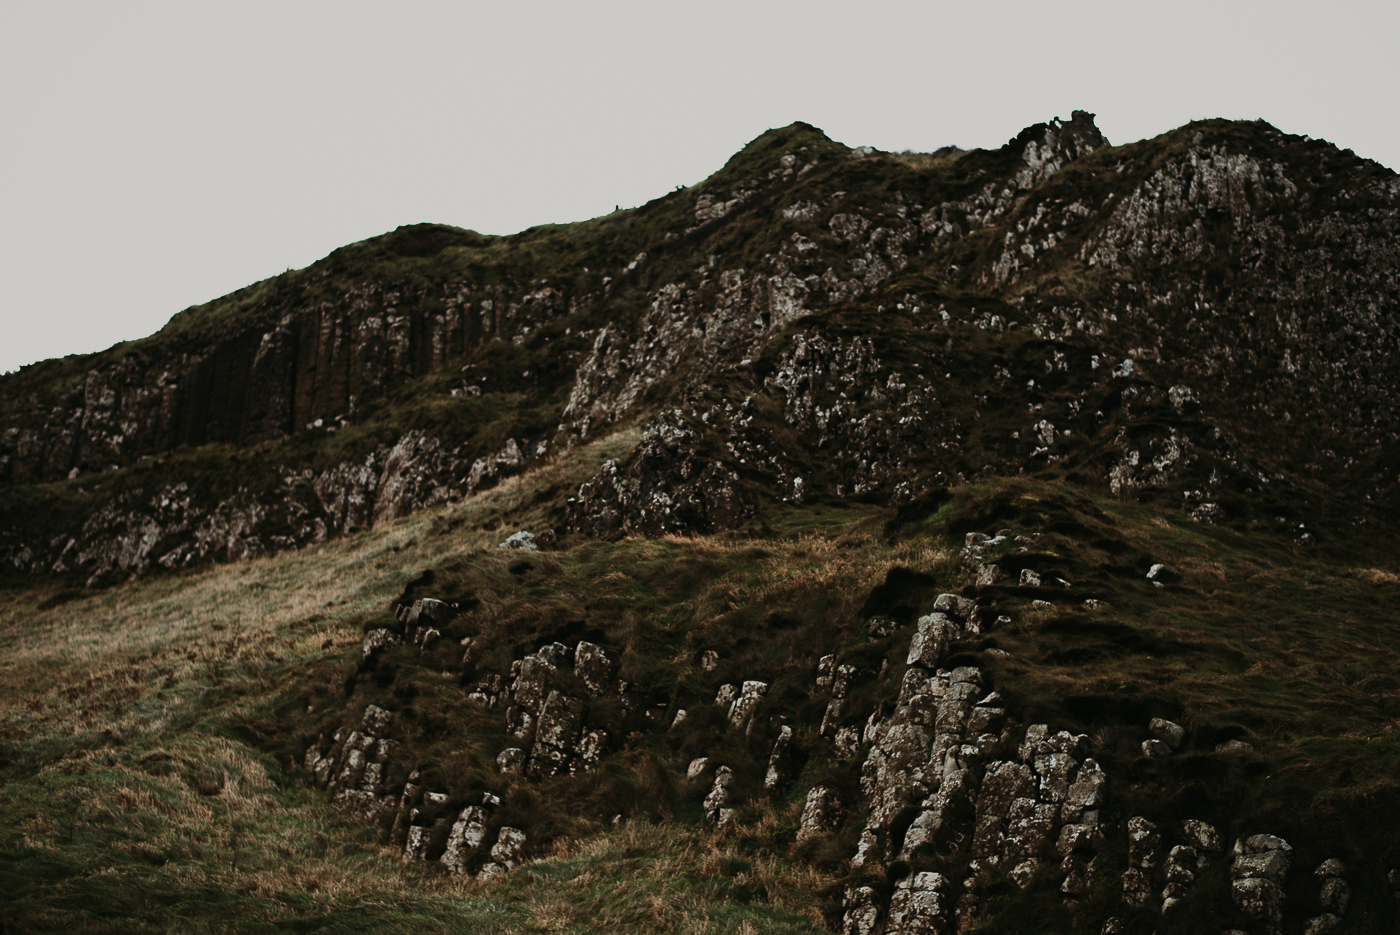 Blarney Castle - Ireland - Ireland Wedding Photographer - Traveling Wedding Photographer - Giant's Causeway - Benbulbin - UK Wedding Photographer - London Wedding Photographer - Travel Photography - Kilkenny Castle - Sligo - Claregalway Friary - Dublin Wedding Photographer - Cliffs of Moher